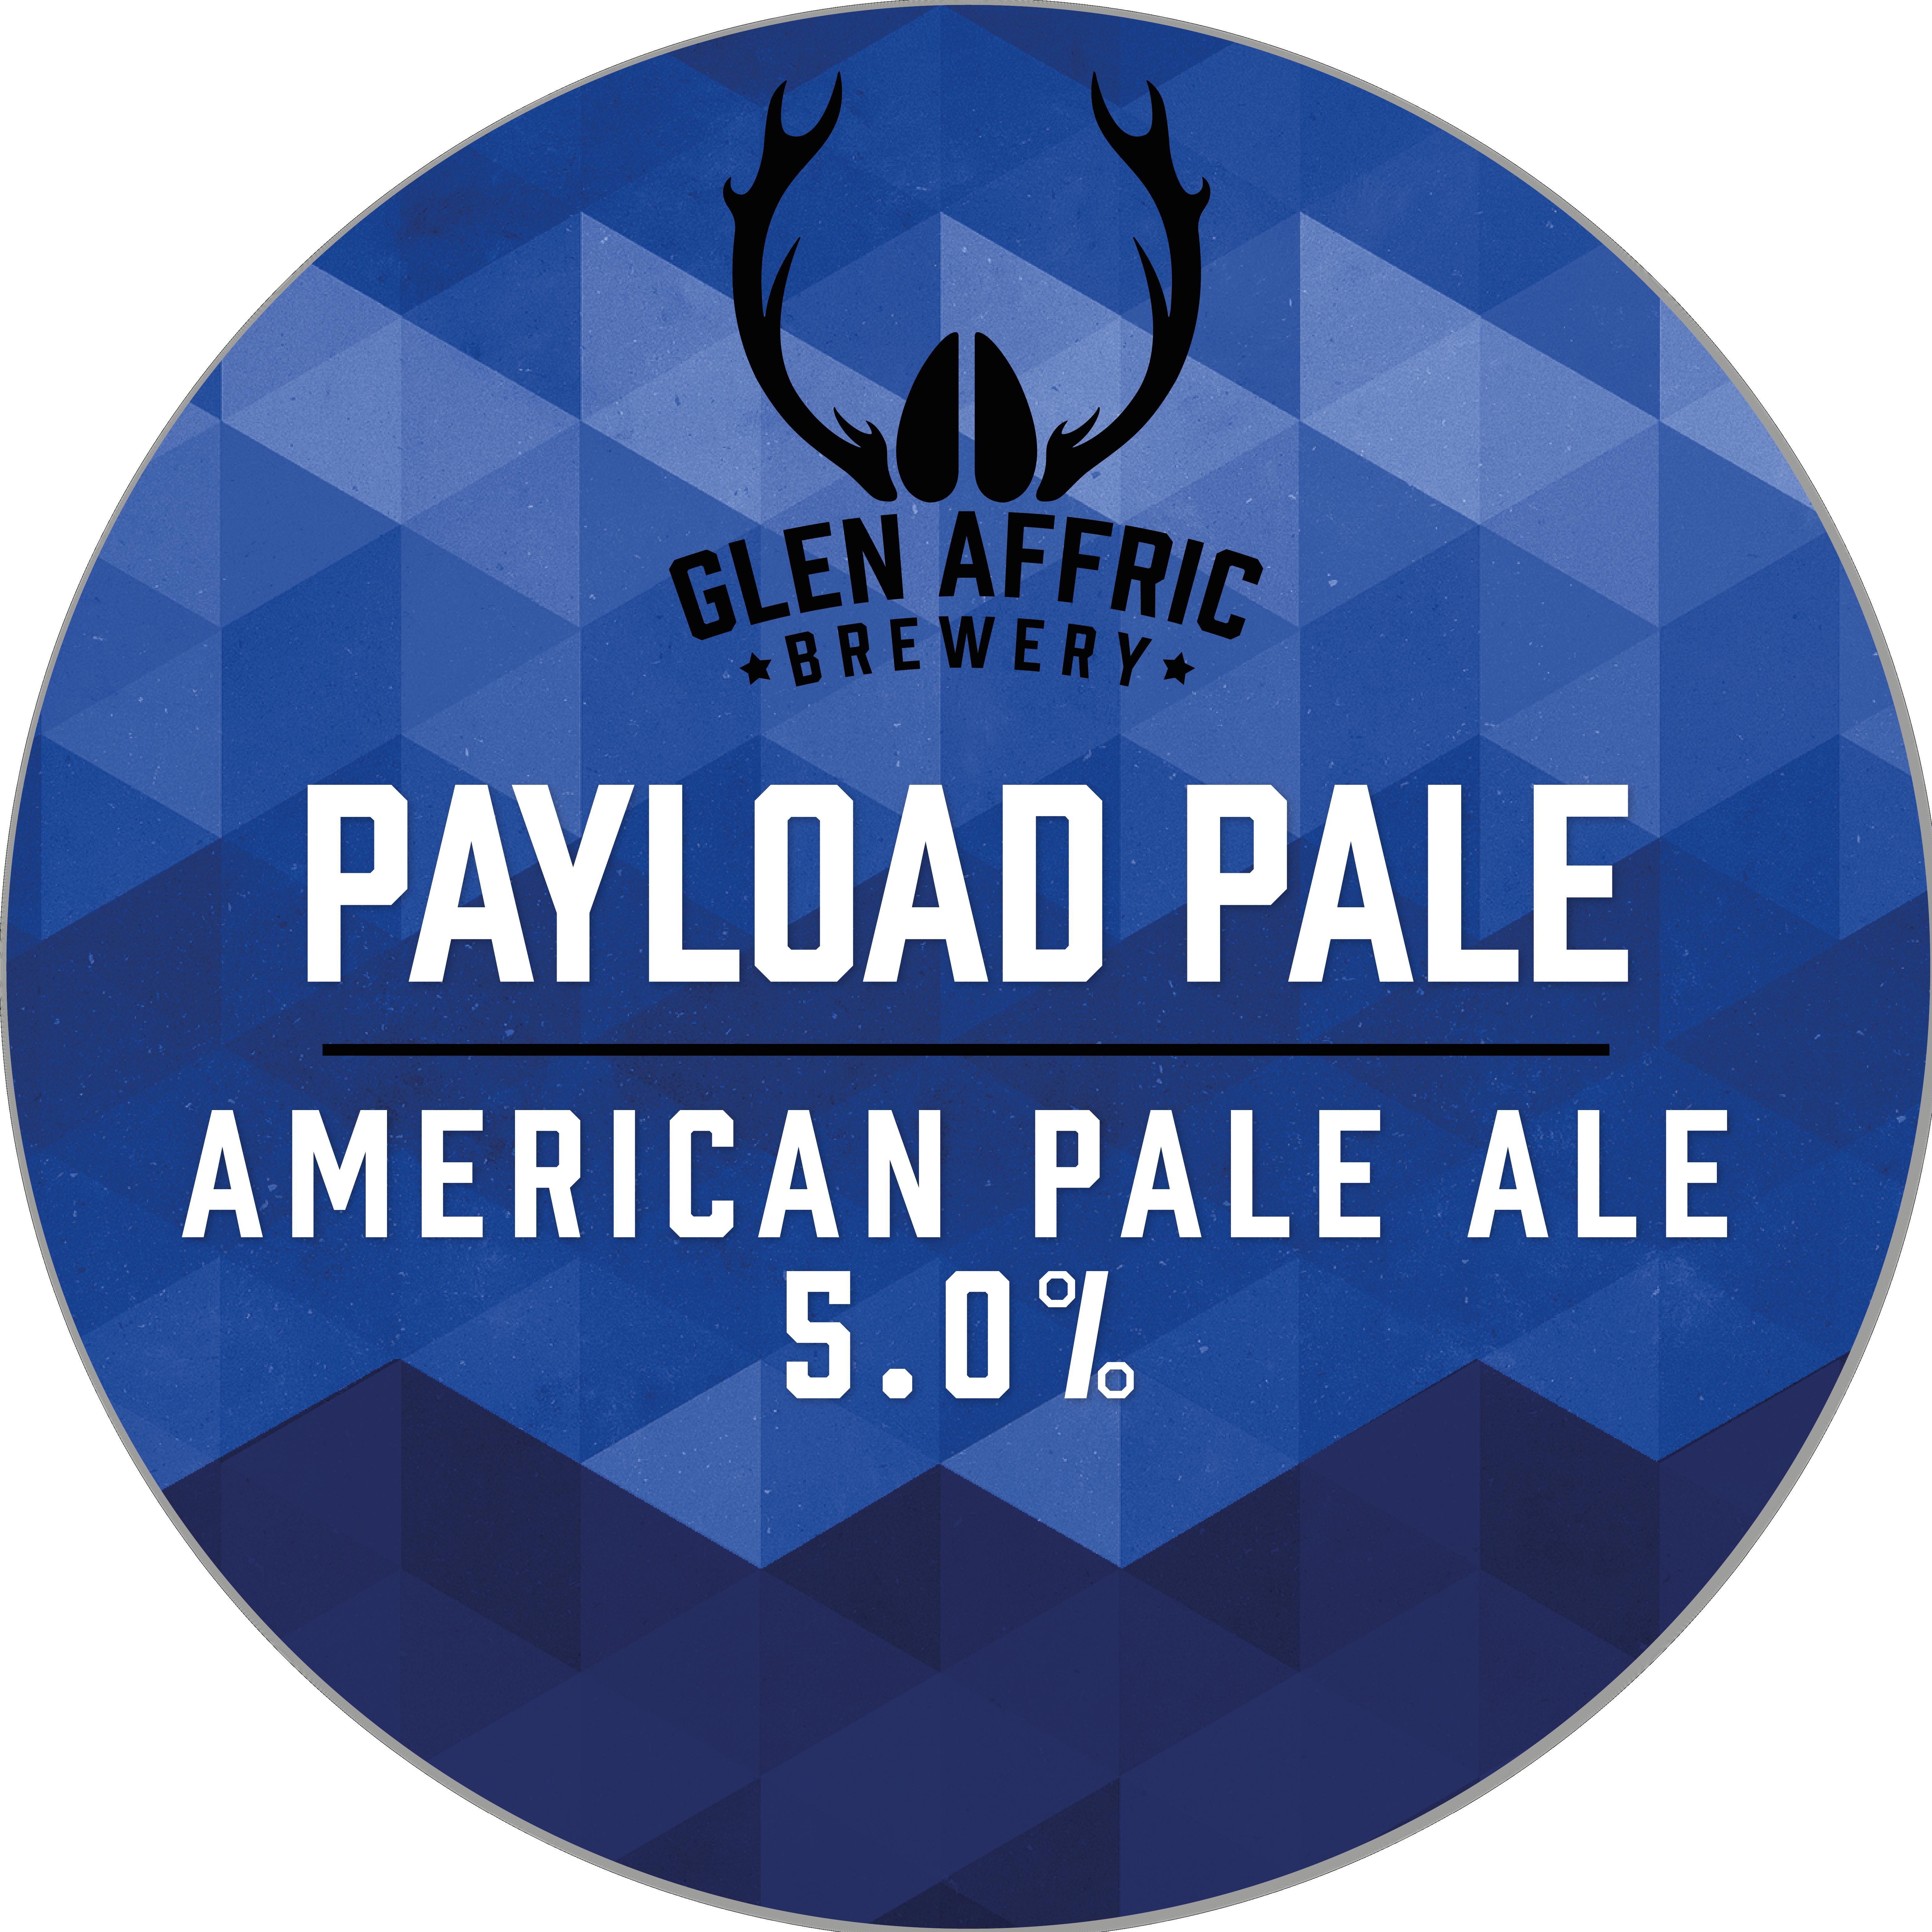 Glen Affric Payload Pale 30Ltr Key Keg 5.0%